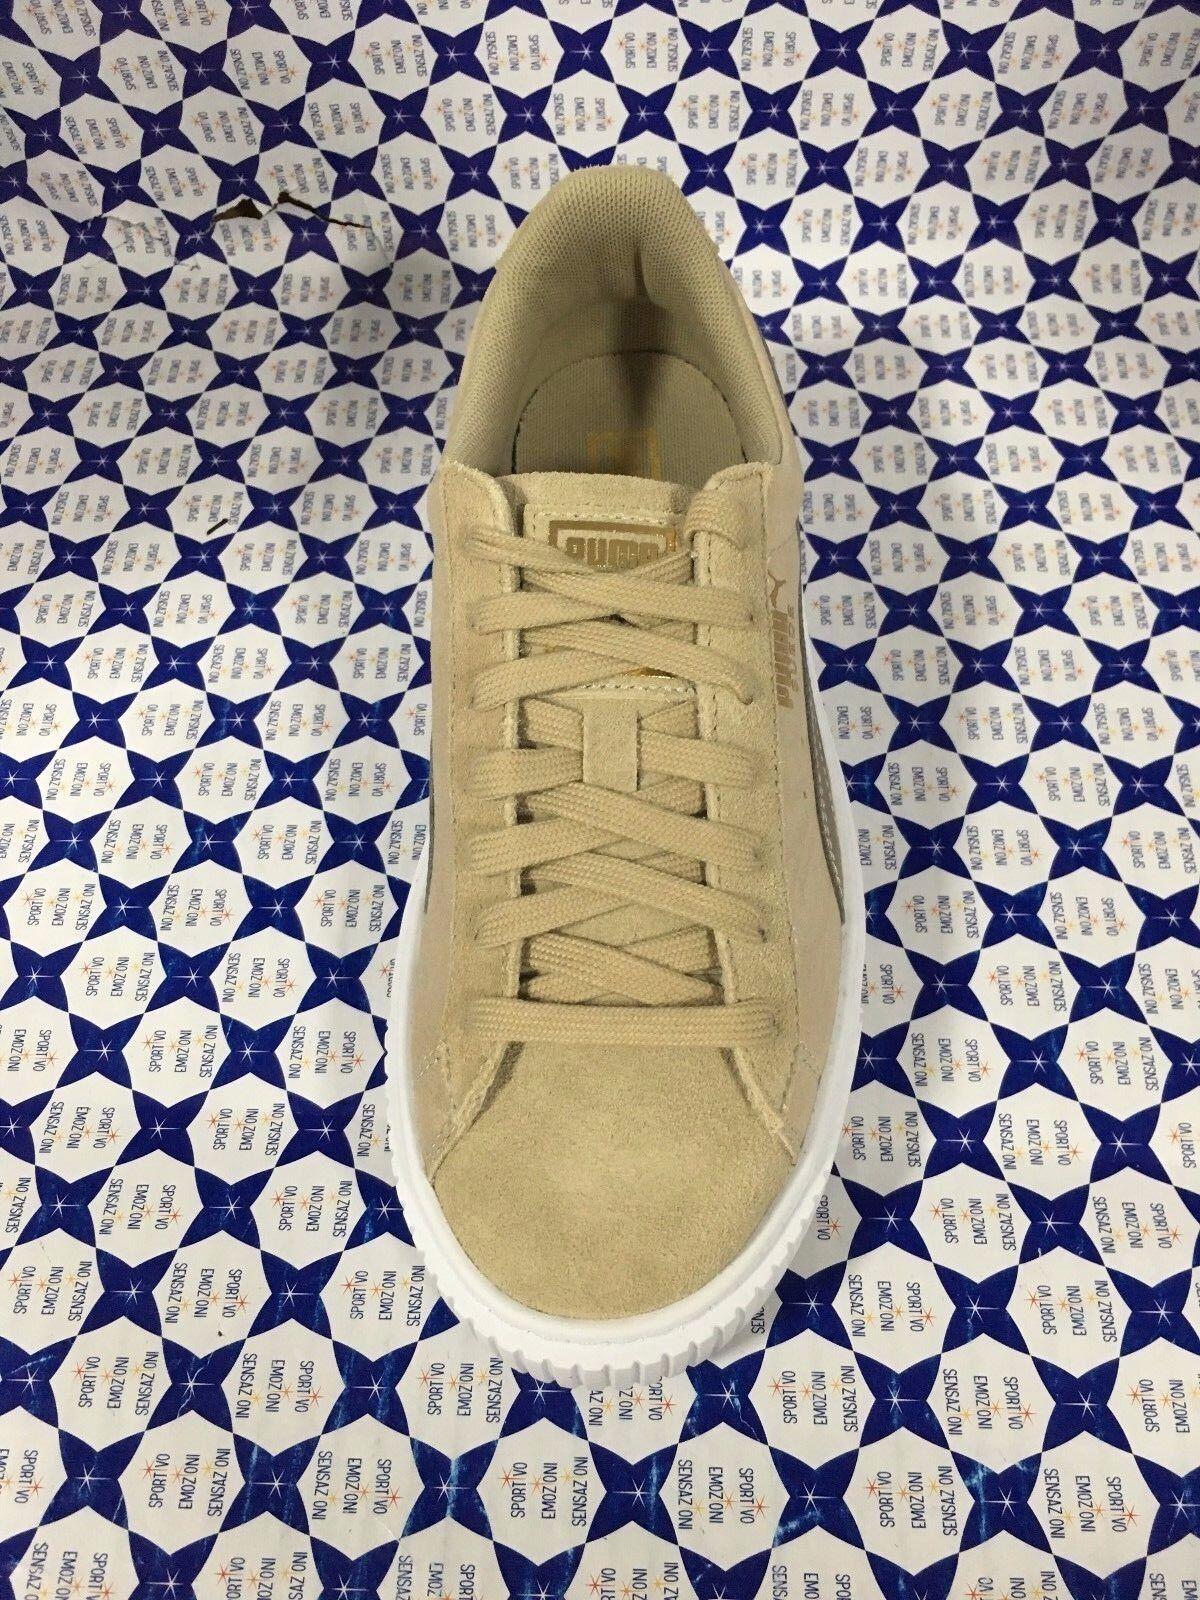 Zapatos PUMA mujer SCONTATE   Basket Platform Platform Platform Core - Beige - 364594 c394f3